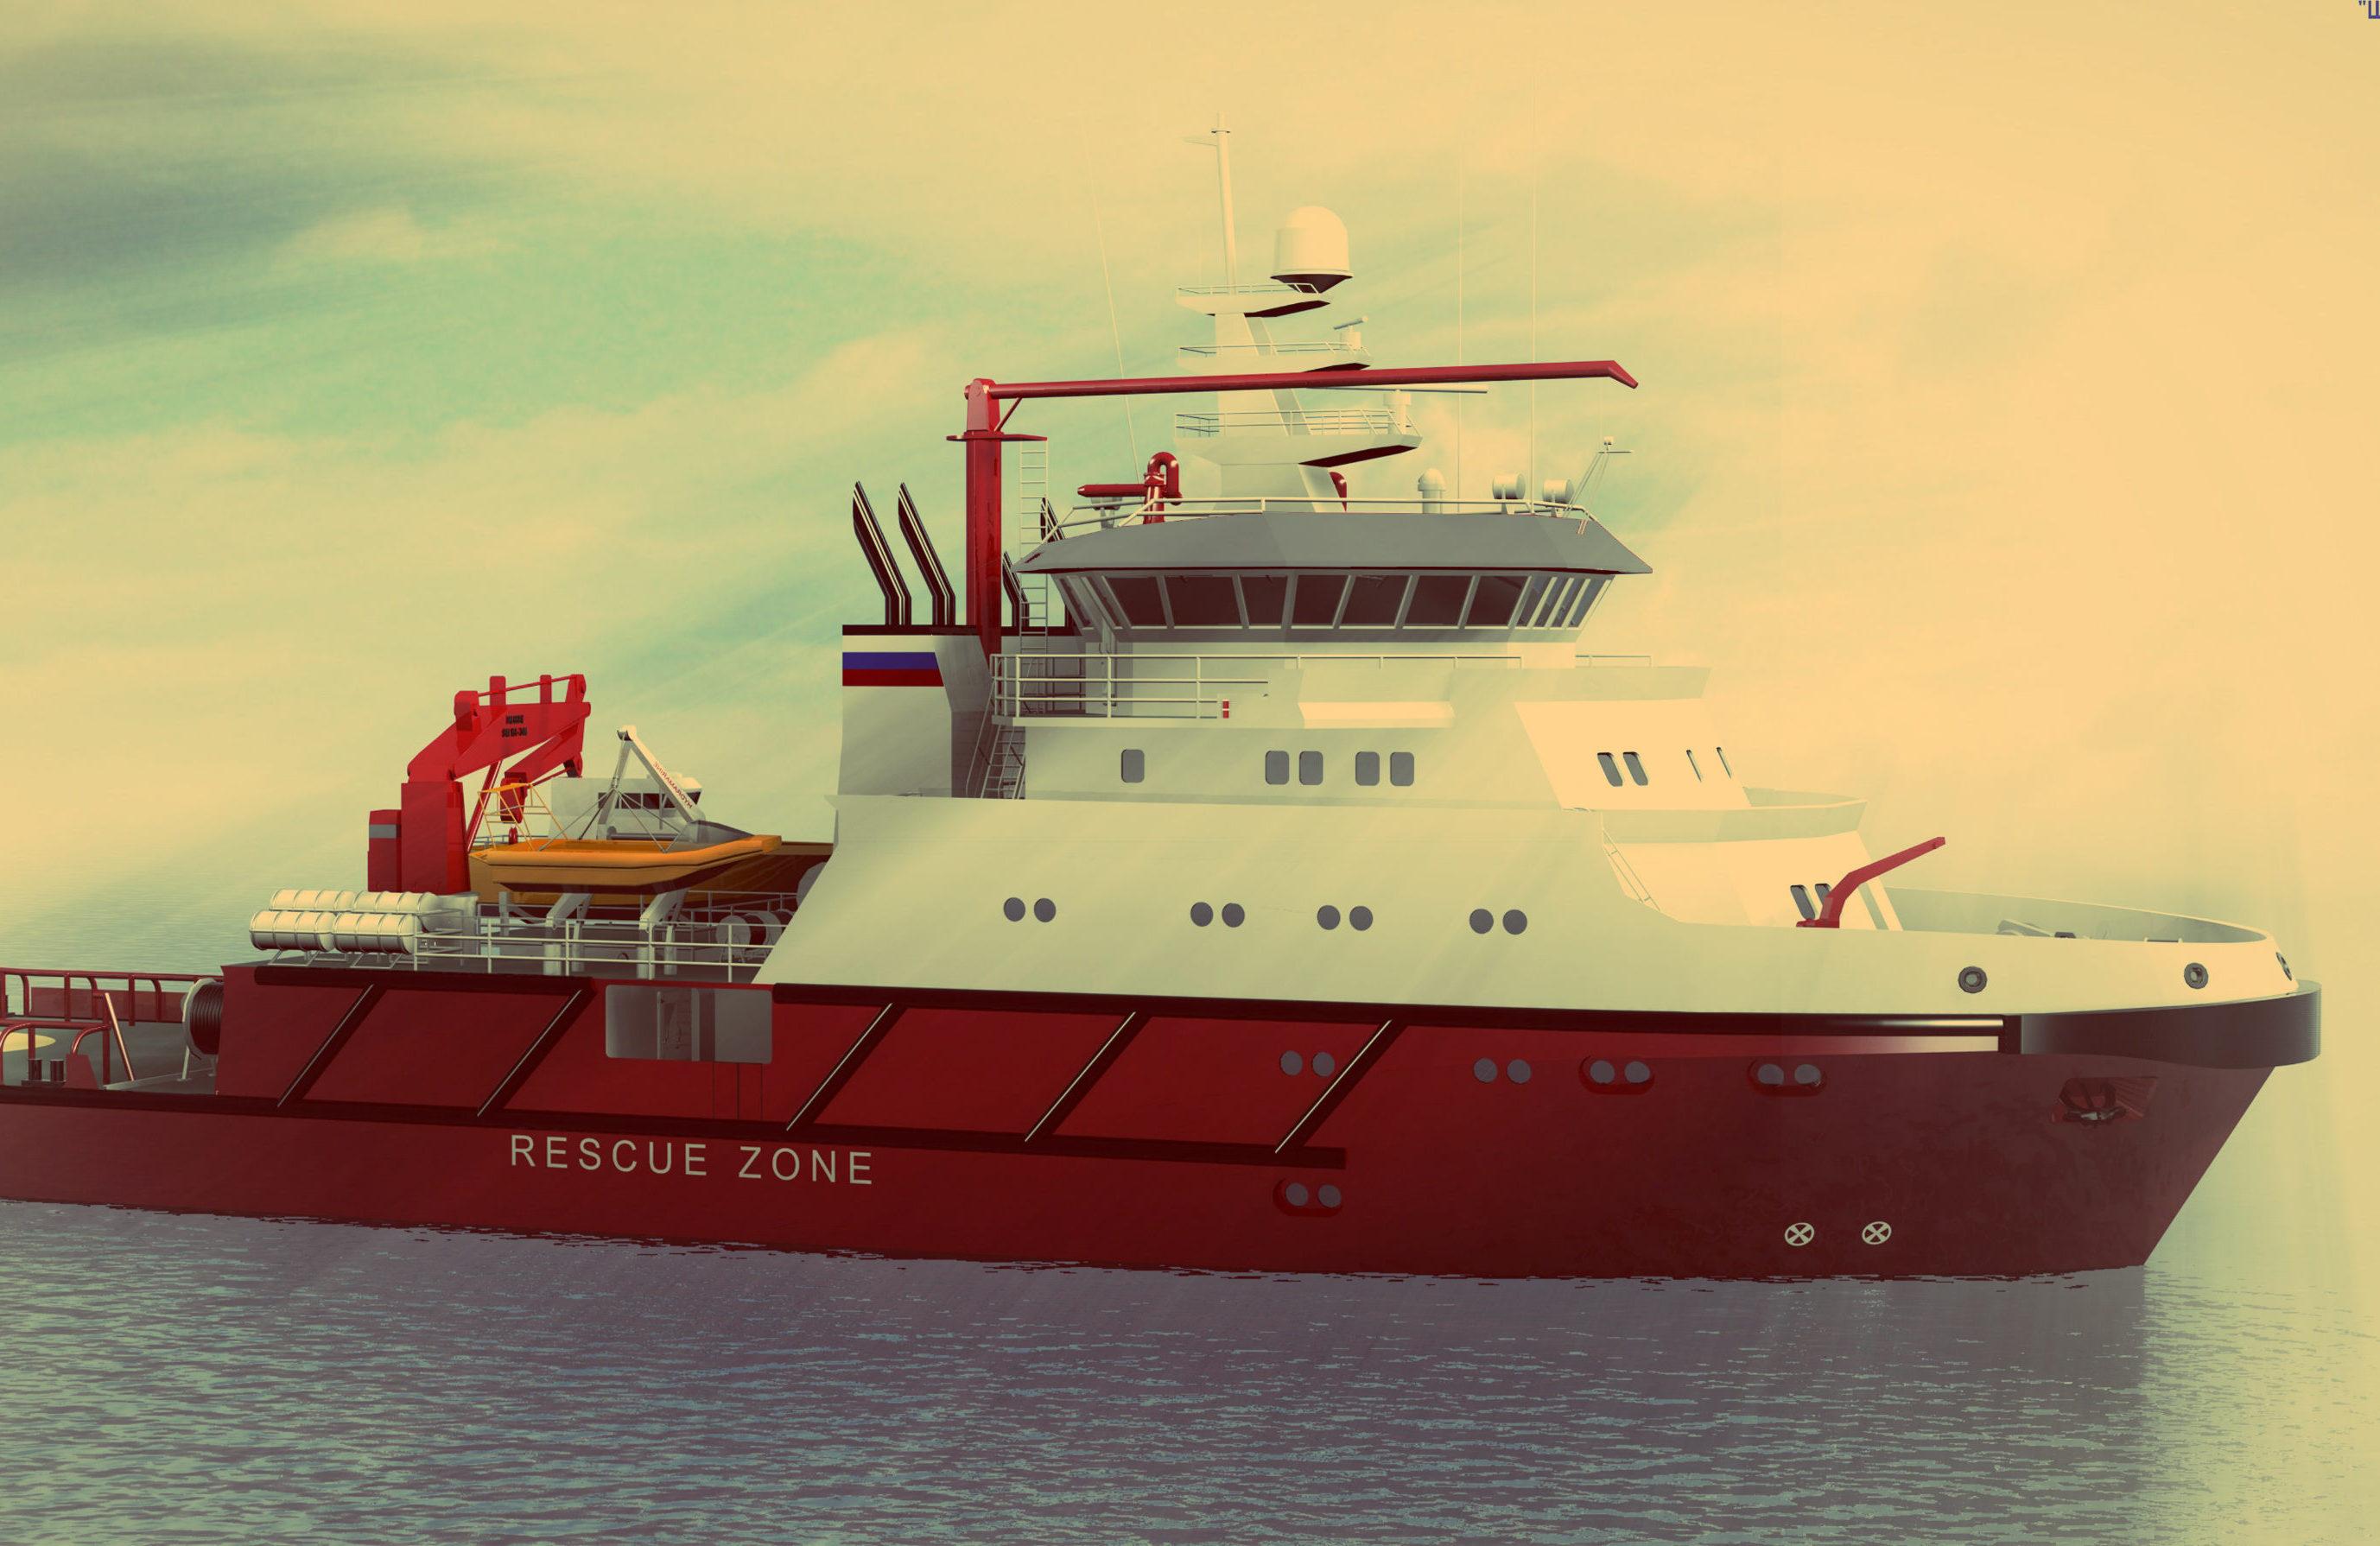 Спасательно-буксирное судно проекта 22870